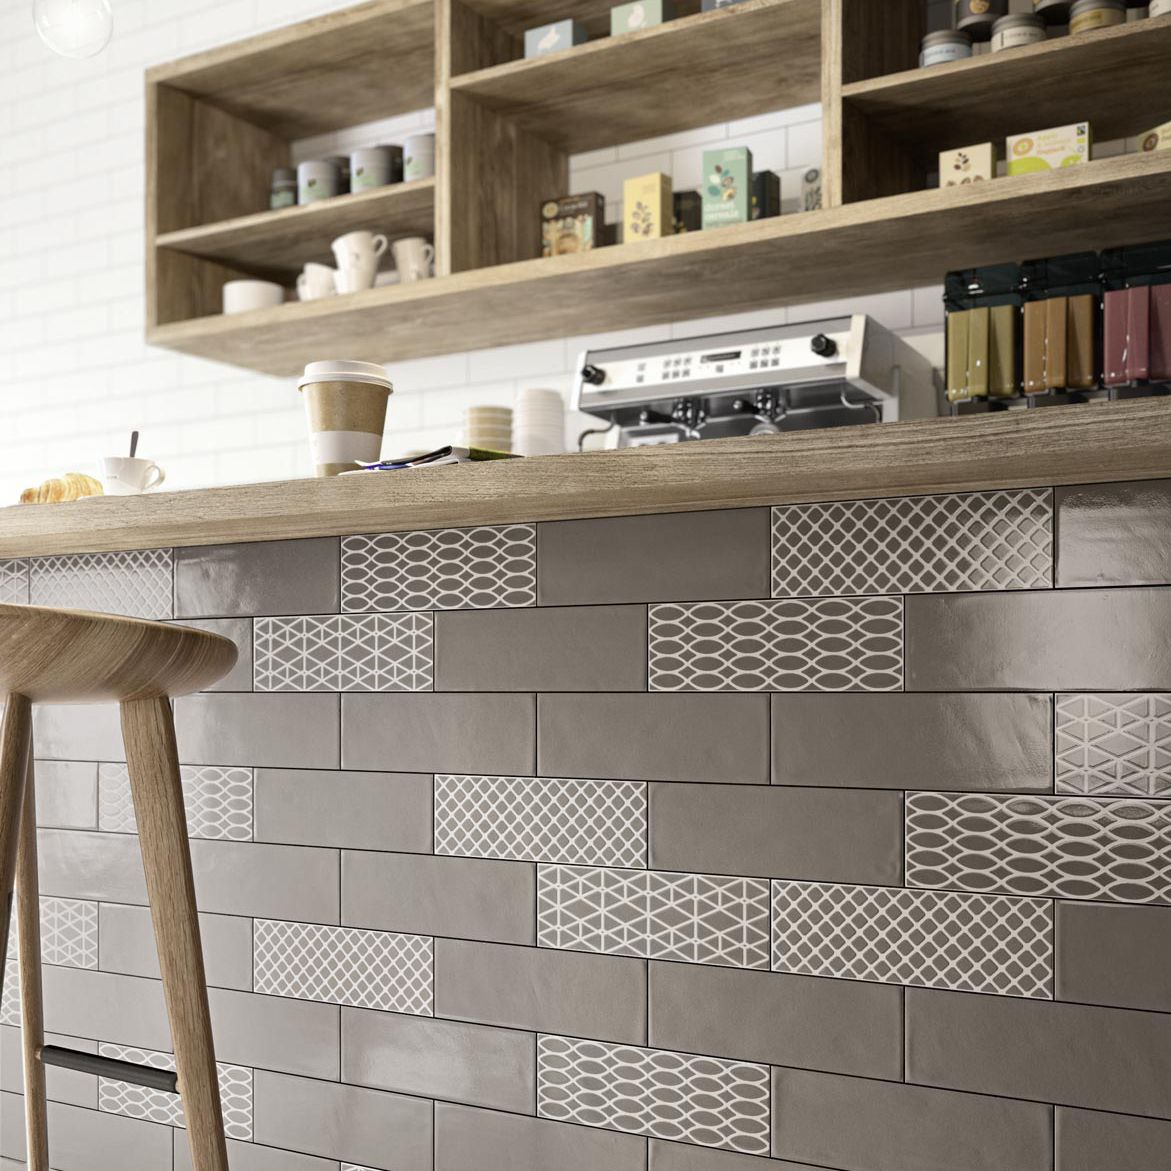 Kitchen Wall Tiling Bathroom Tile Kitchen Wall Ceramic Brick Glossy Ragno